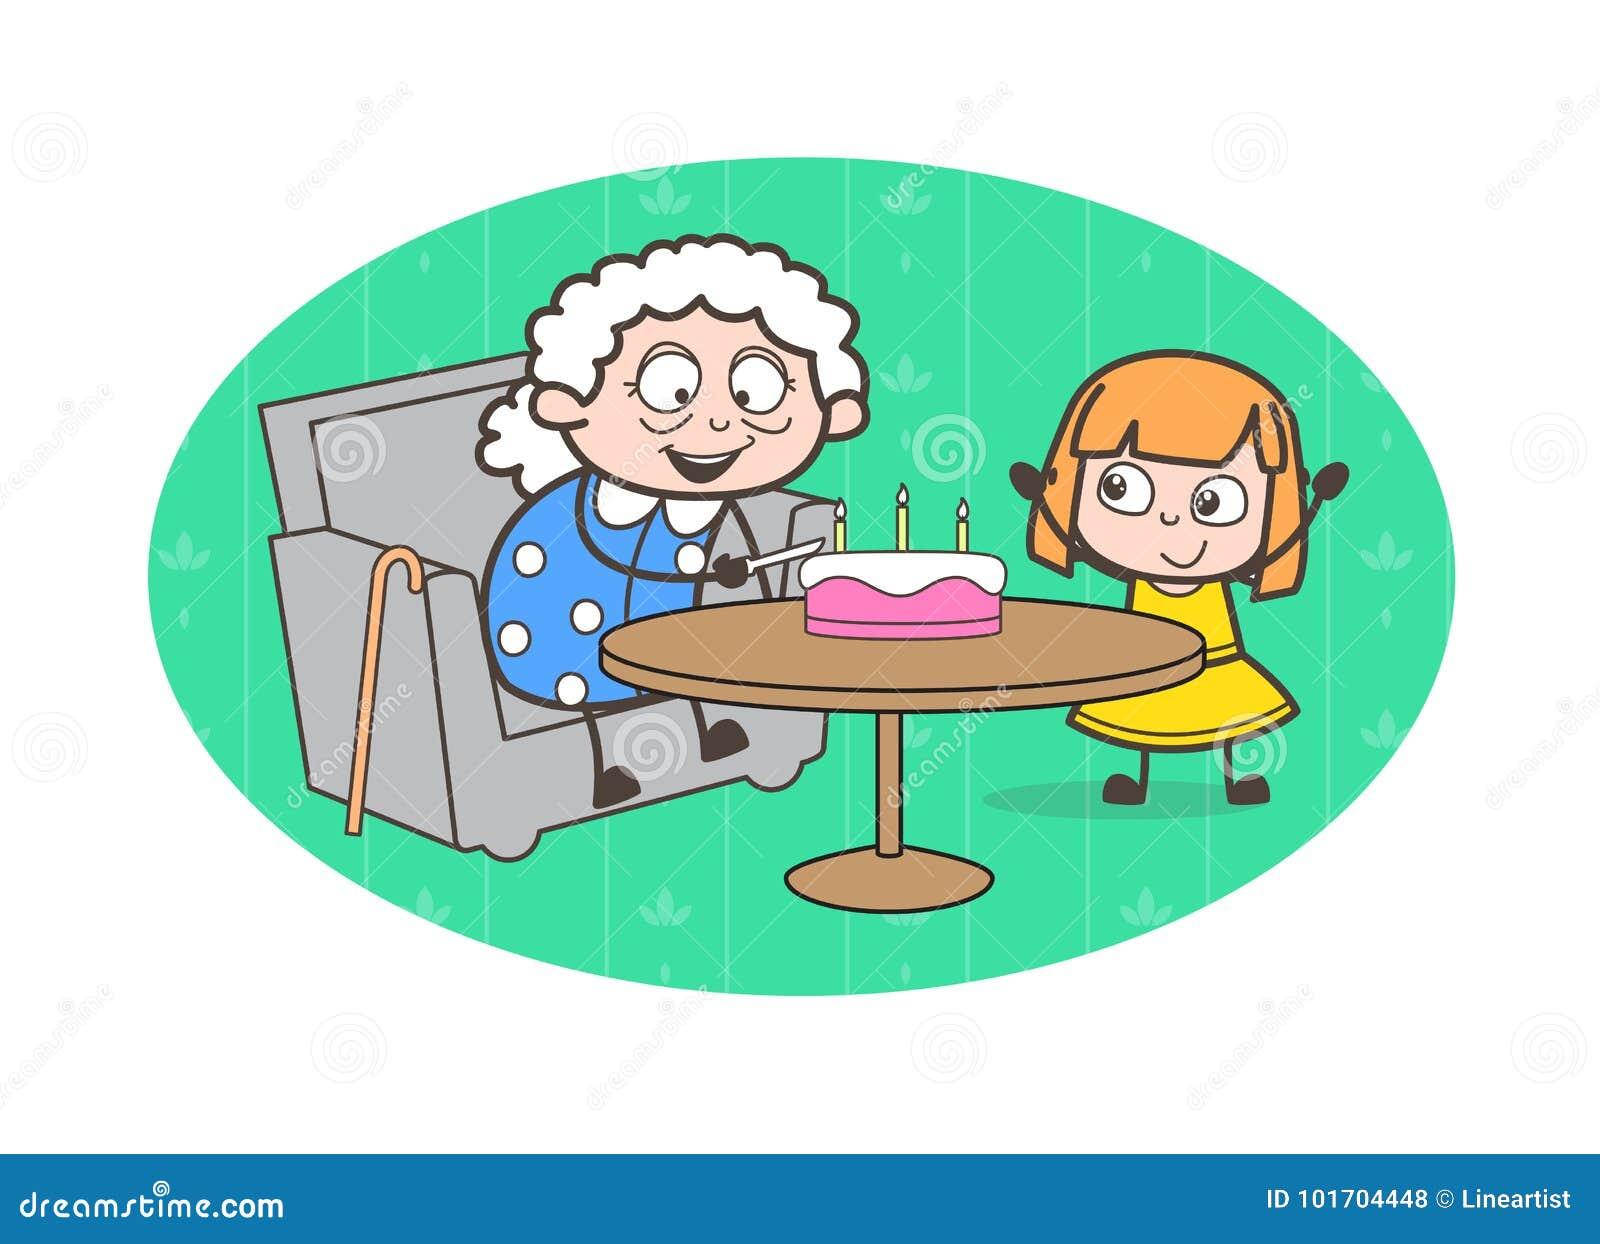 Granddaughter Birthday Stock Illustrations 122 Granddaughter Birthday Stock Illustrations Vectors Clipart Dreamstime